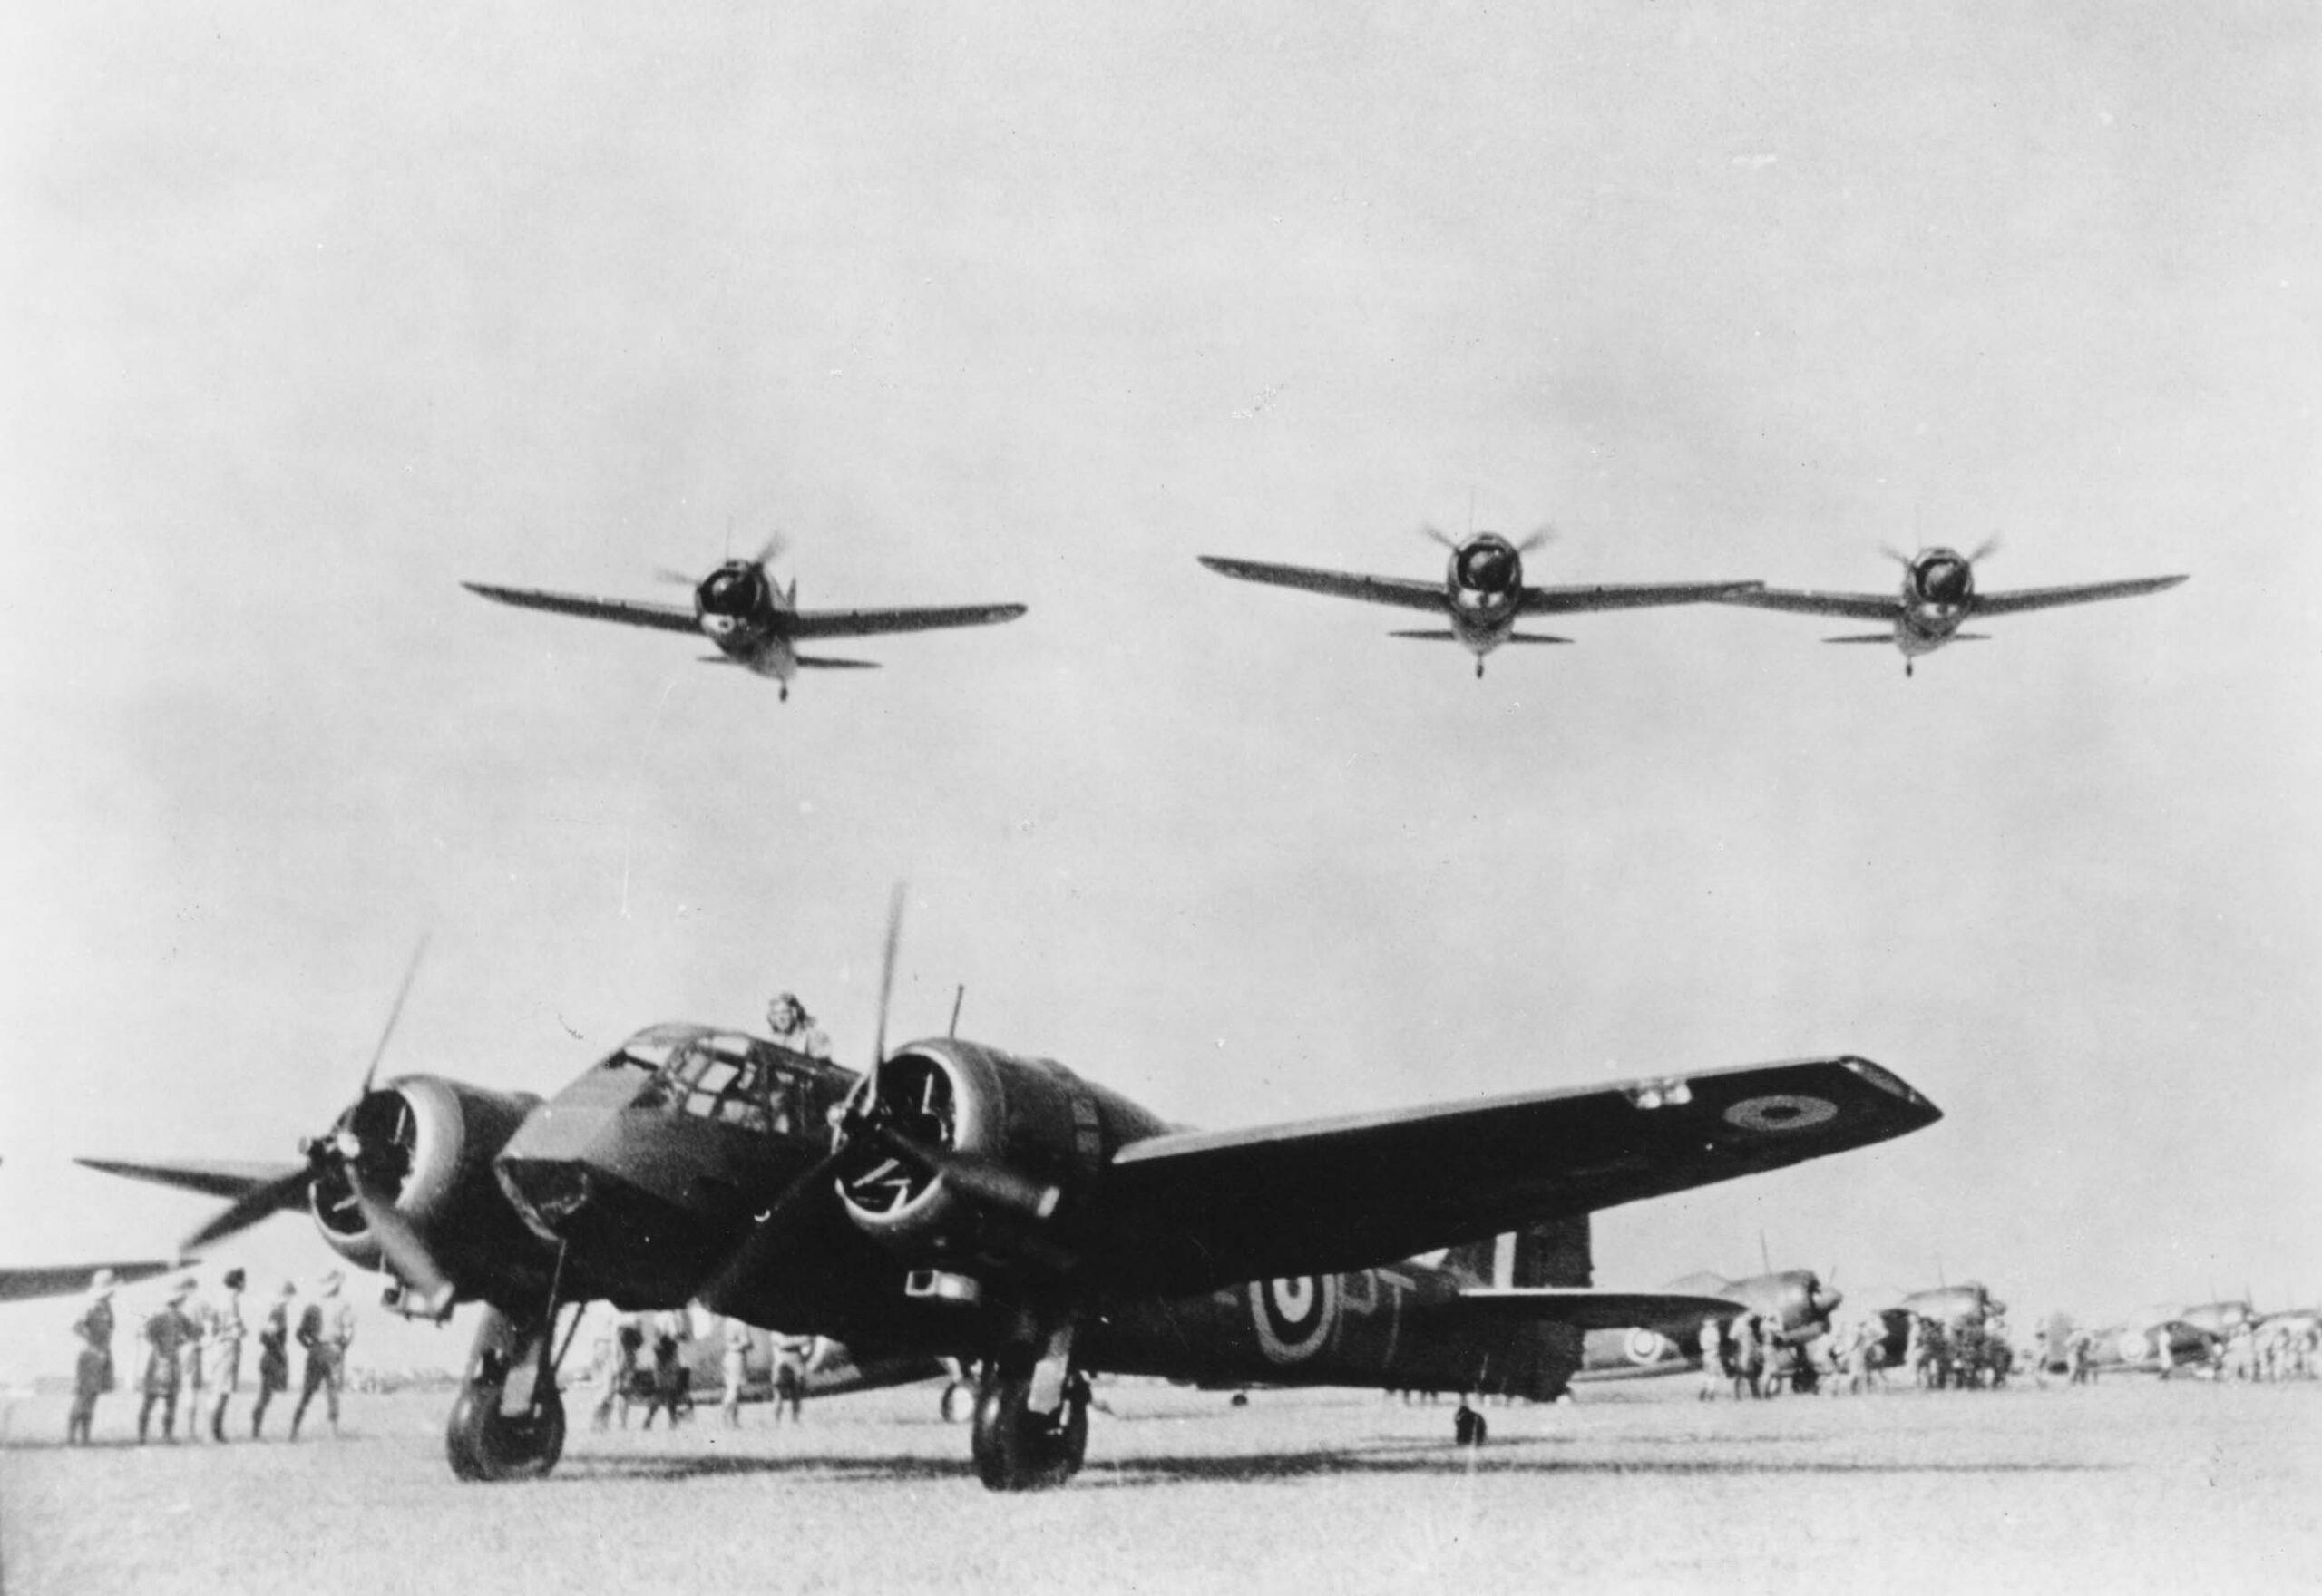 Three Brewster Buffalos fly over a No. 62 Squadron Bristol Blenheim at RAF Tengah, circa 1941 (RAFM X003-2674/1448)